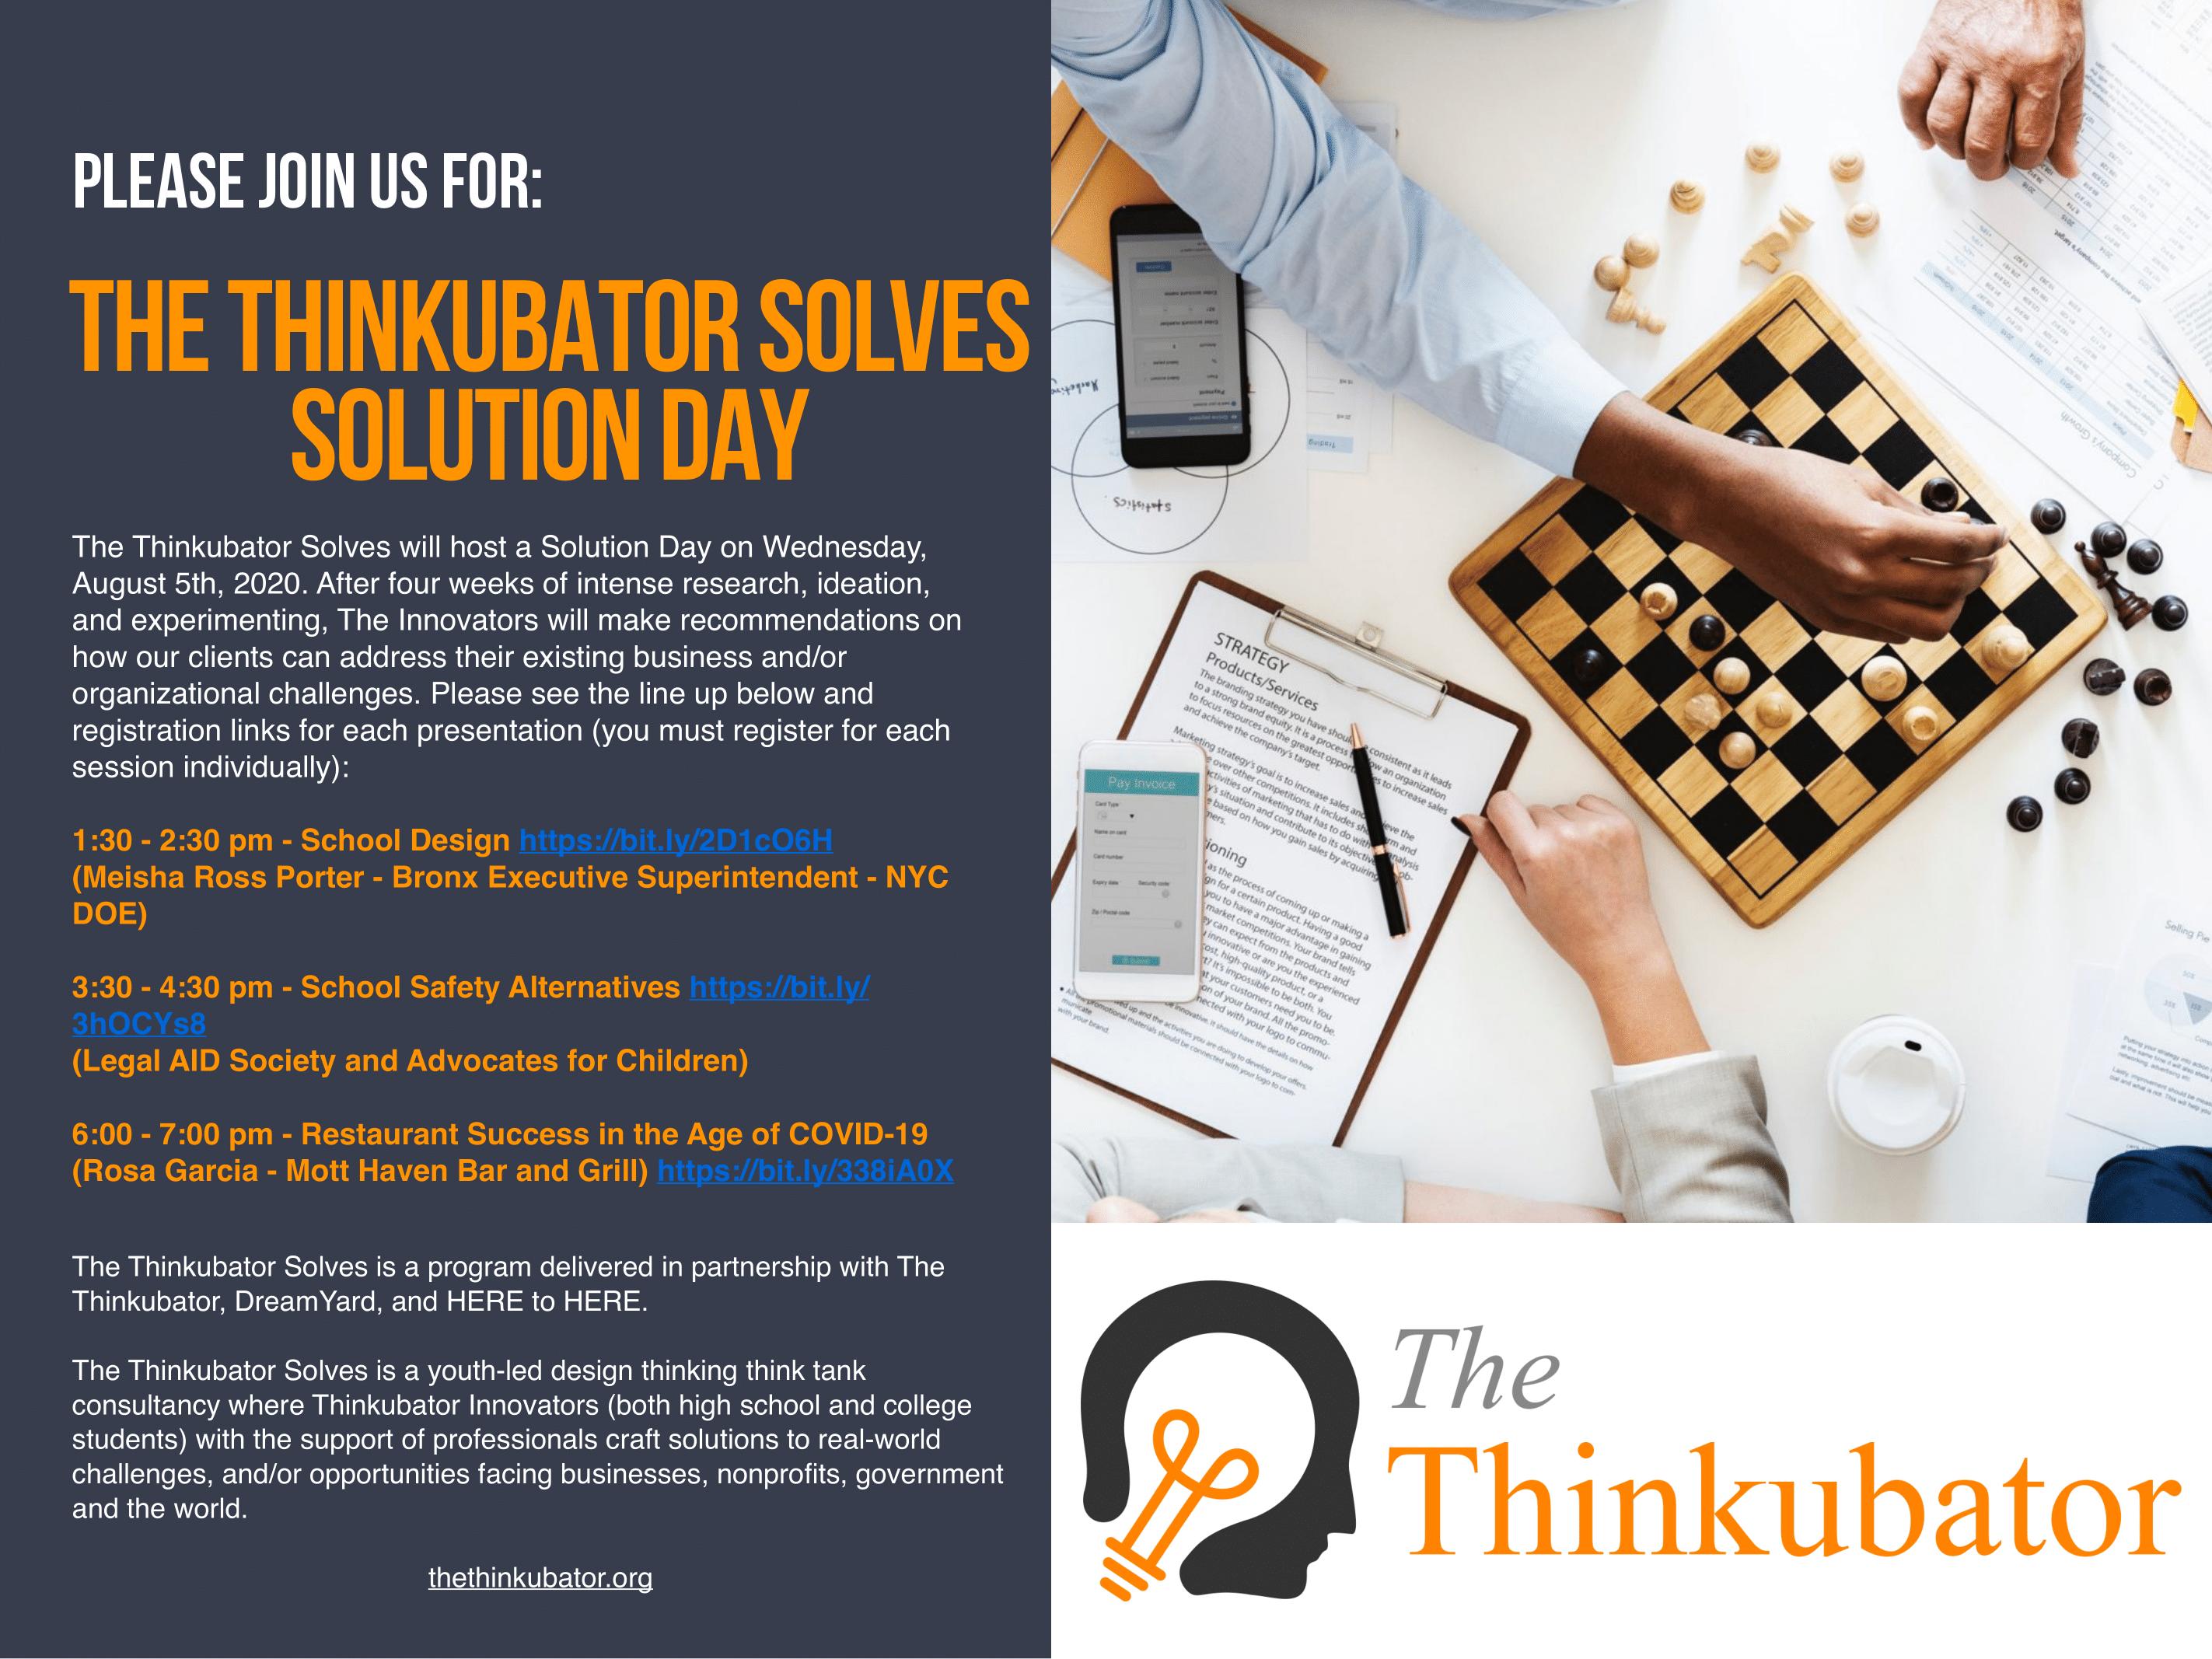 The Thinkubator Solves Solution Day